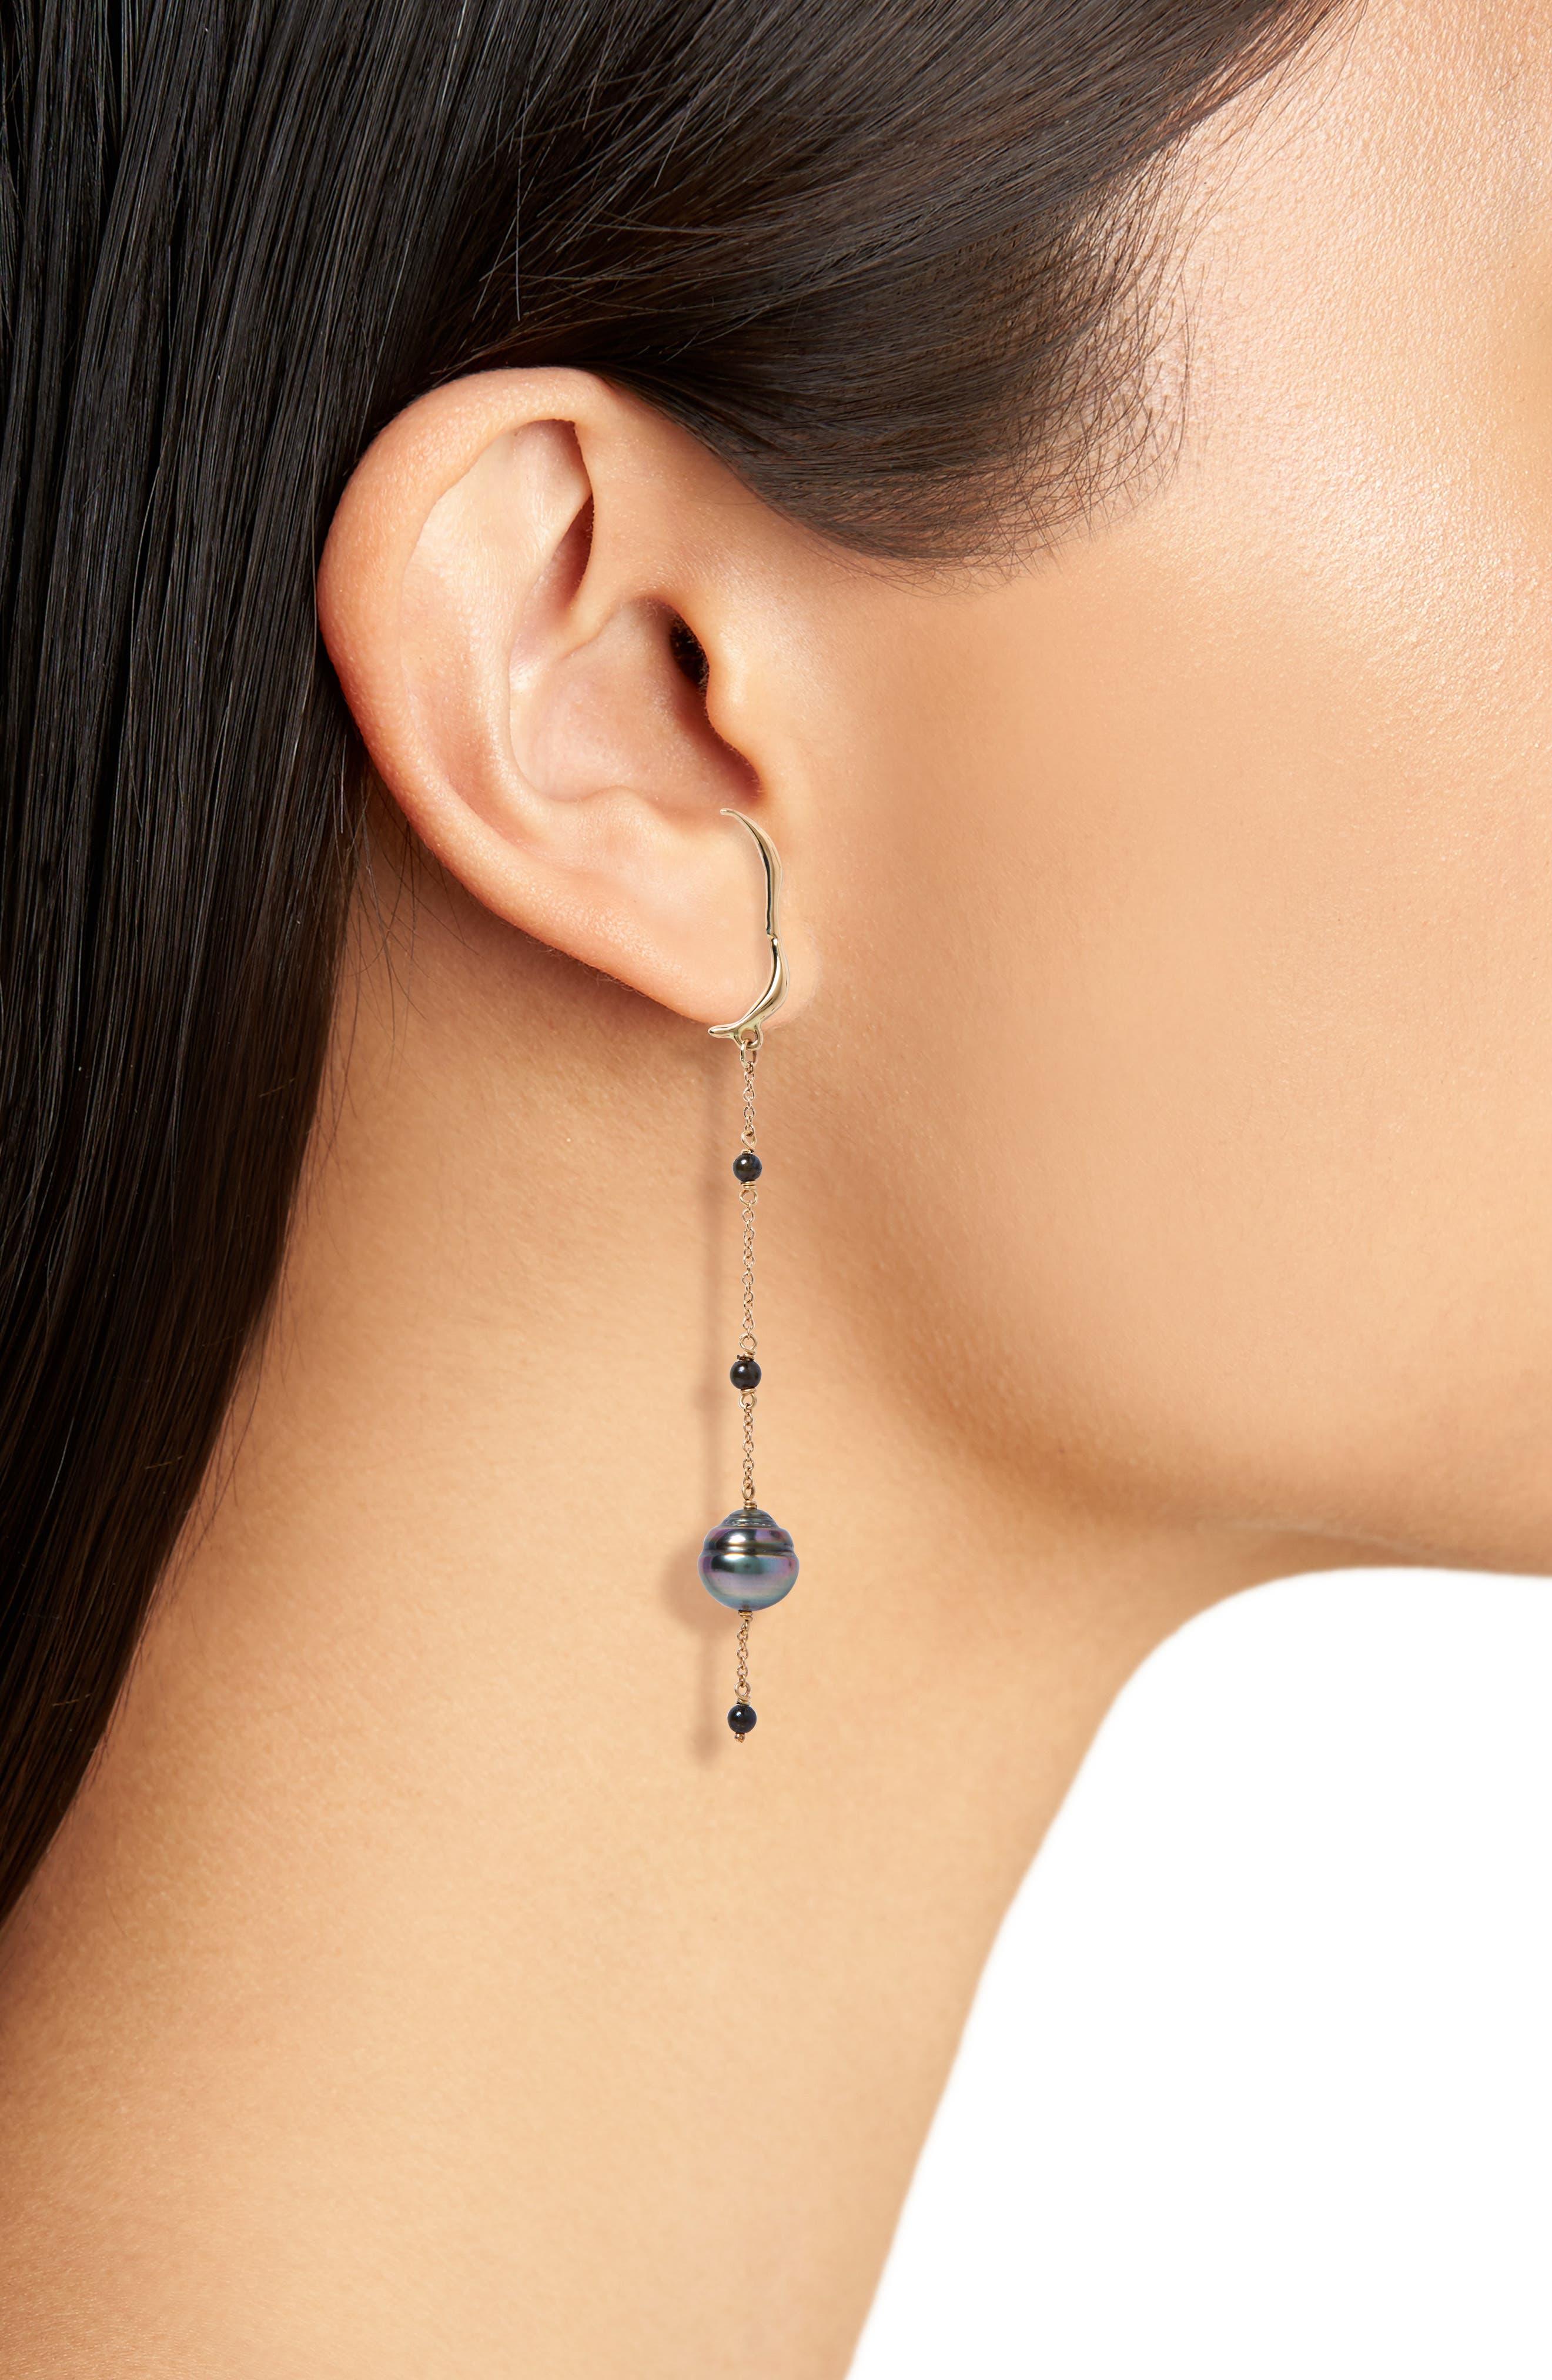 Aura Cultured Pearl Drop Earrings,                             Alternate thumbnail 2, color,                             Gold/ Black Pearl